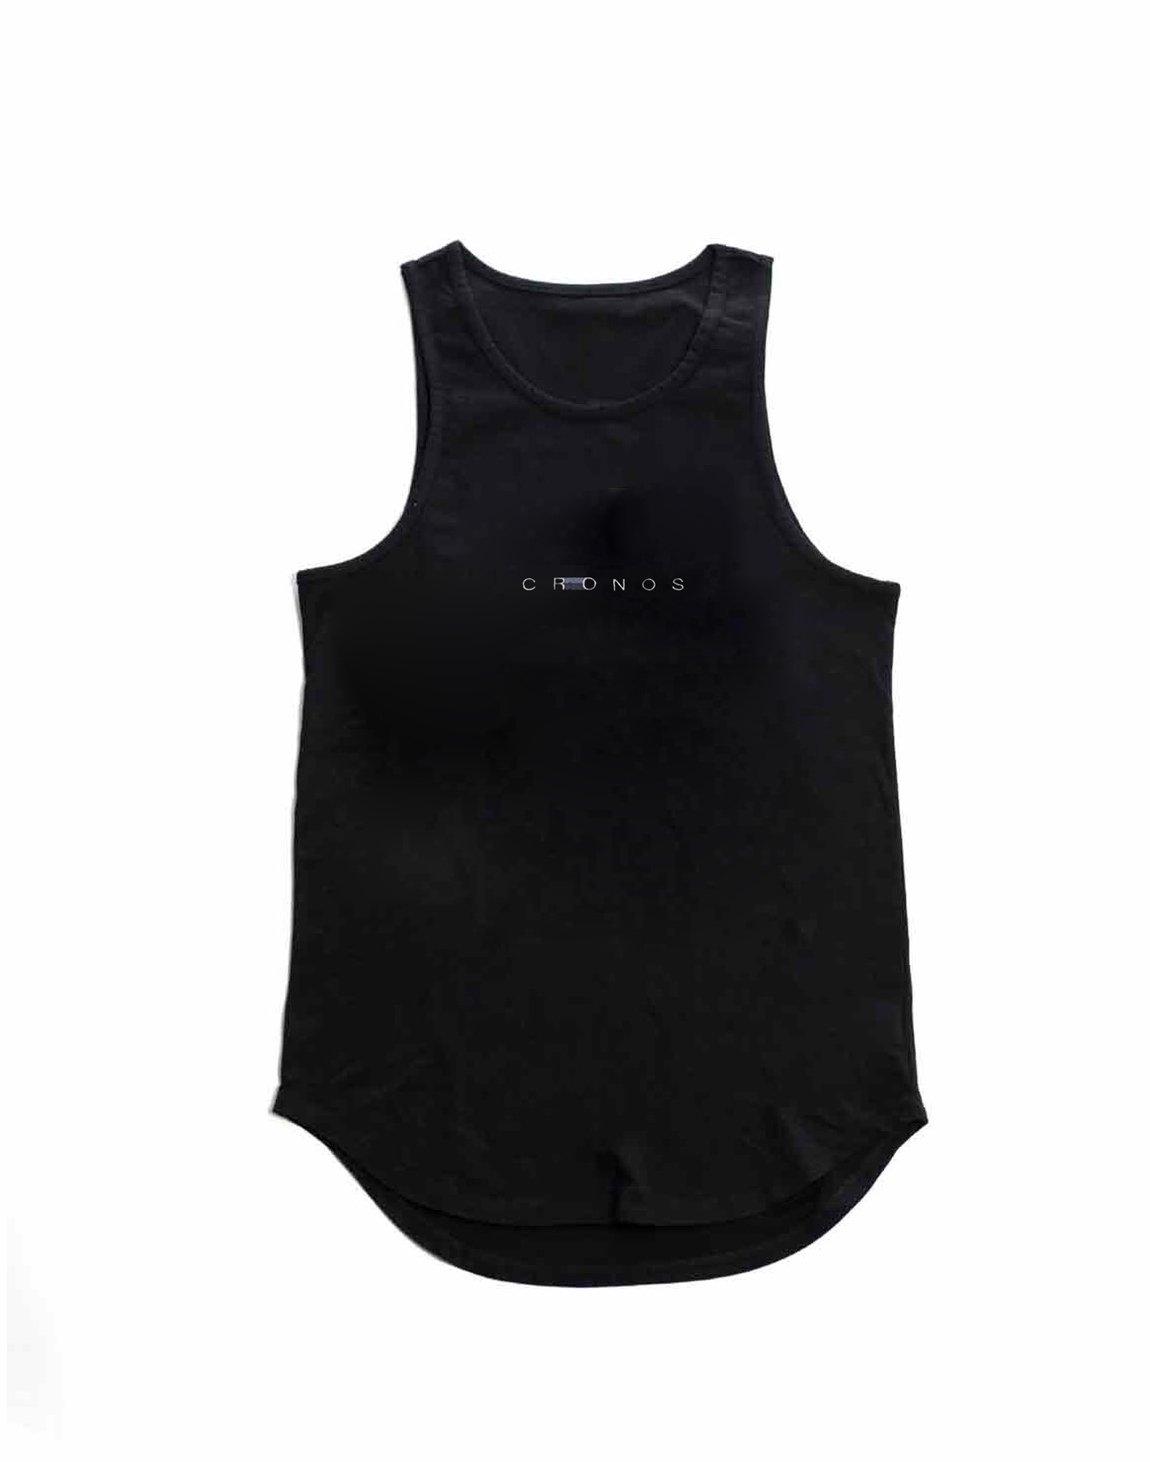 CRONOS STITCH TANK TOP【BLACK】